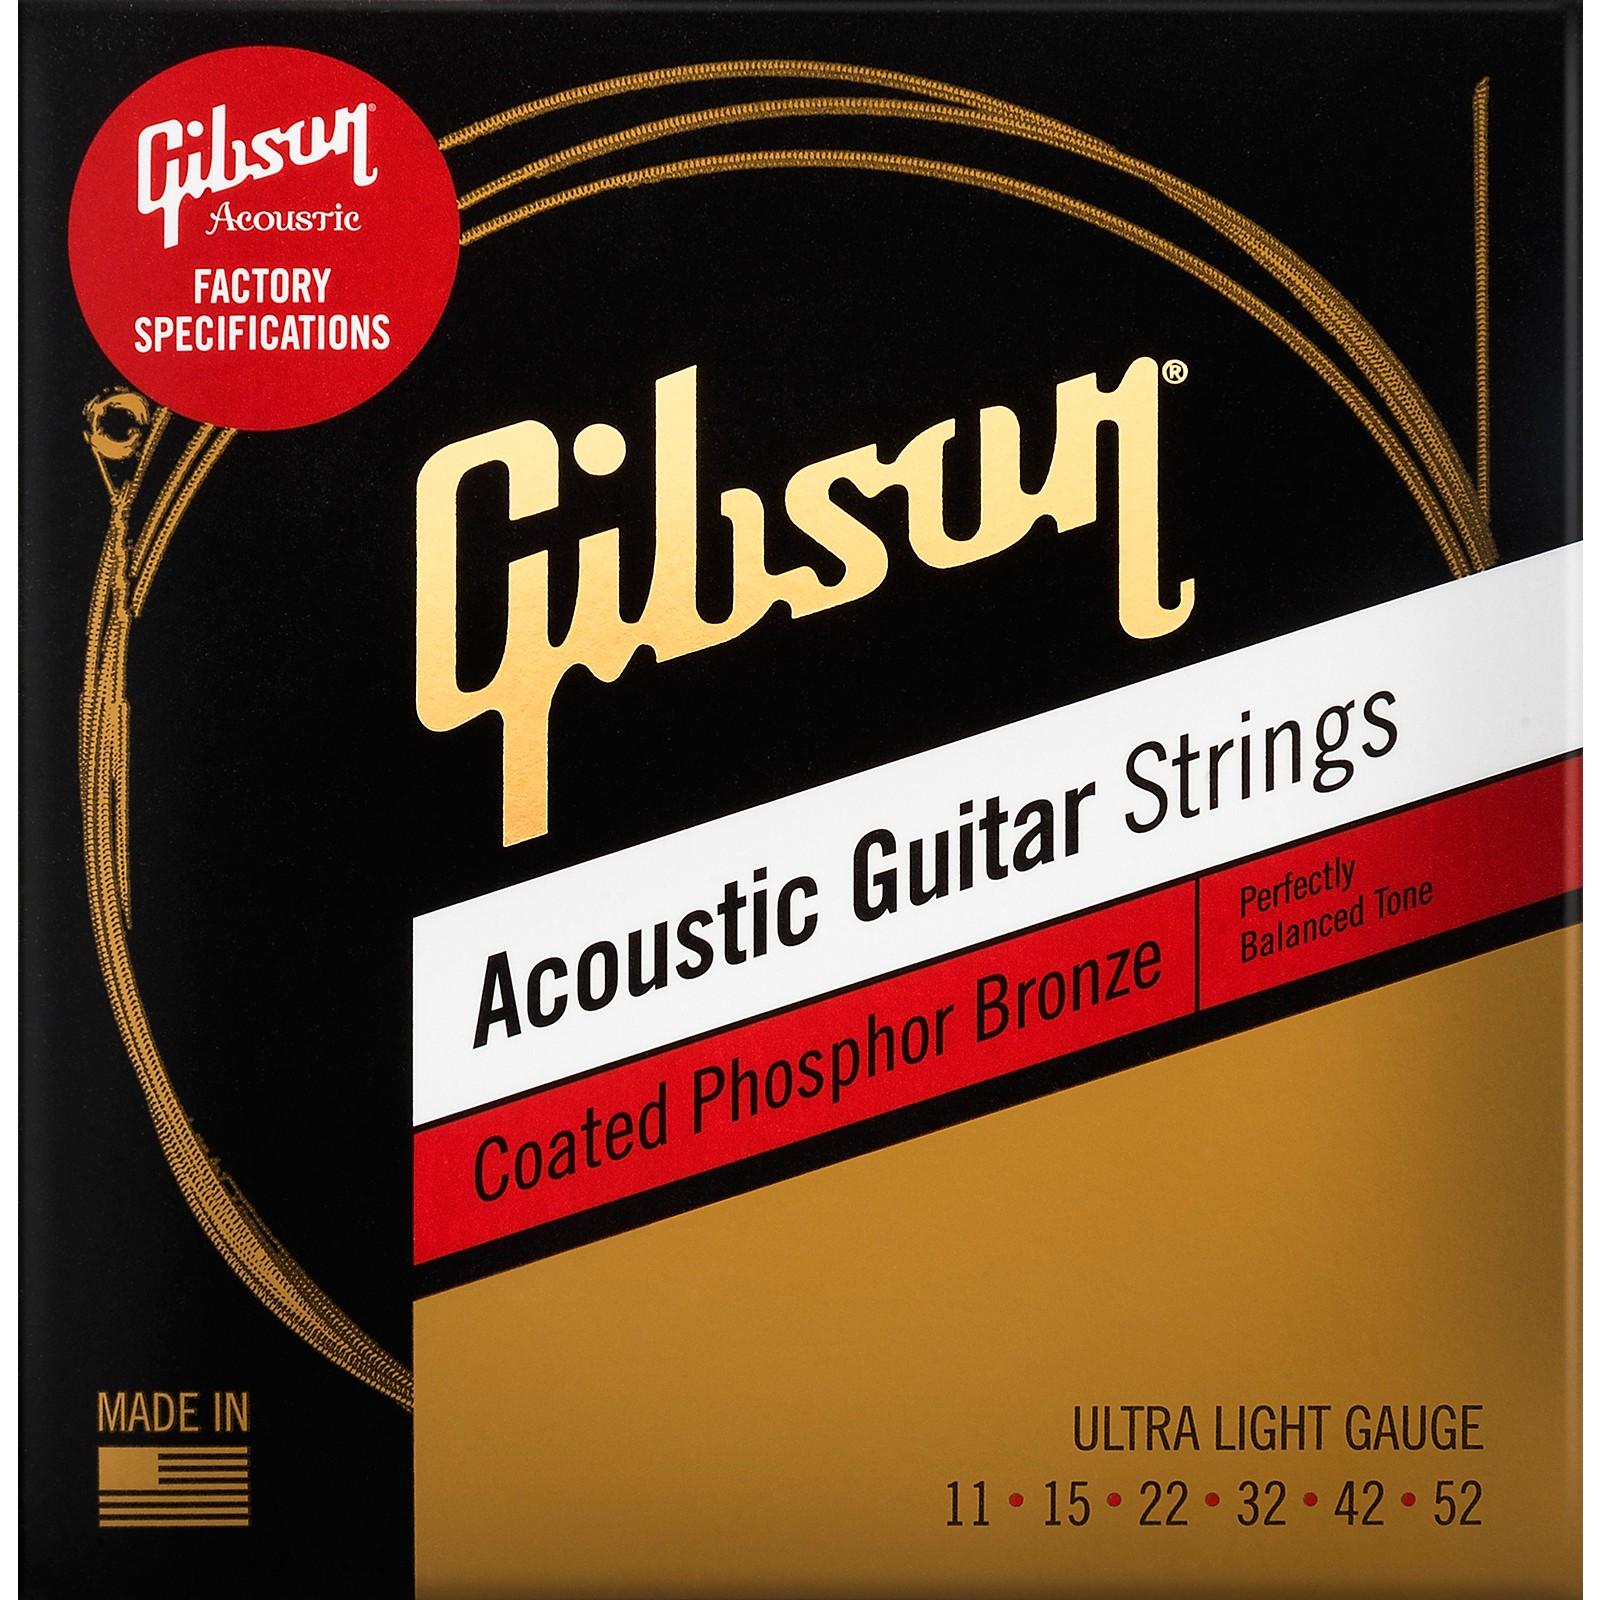 Gibson Coated Phosphor Bronze Acoustic Guitar Strings